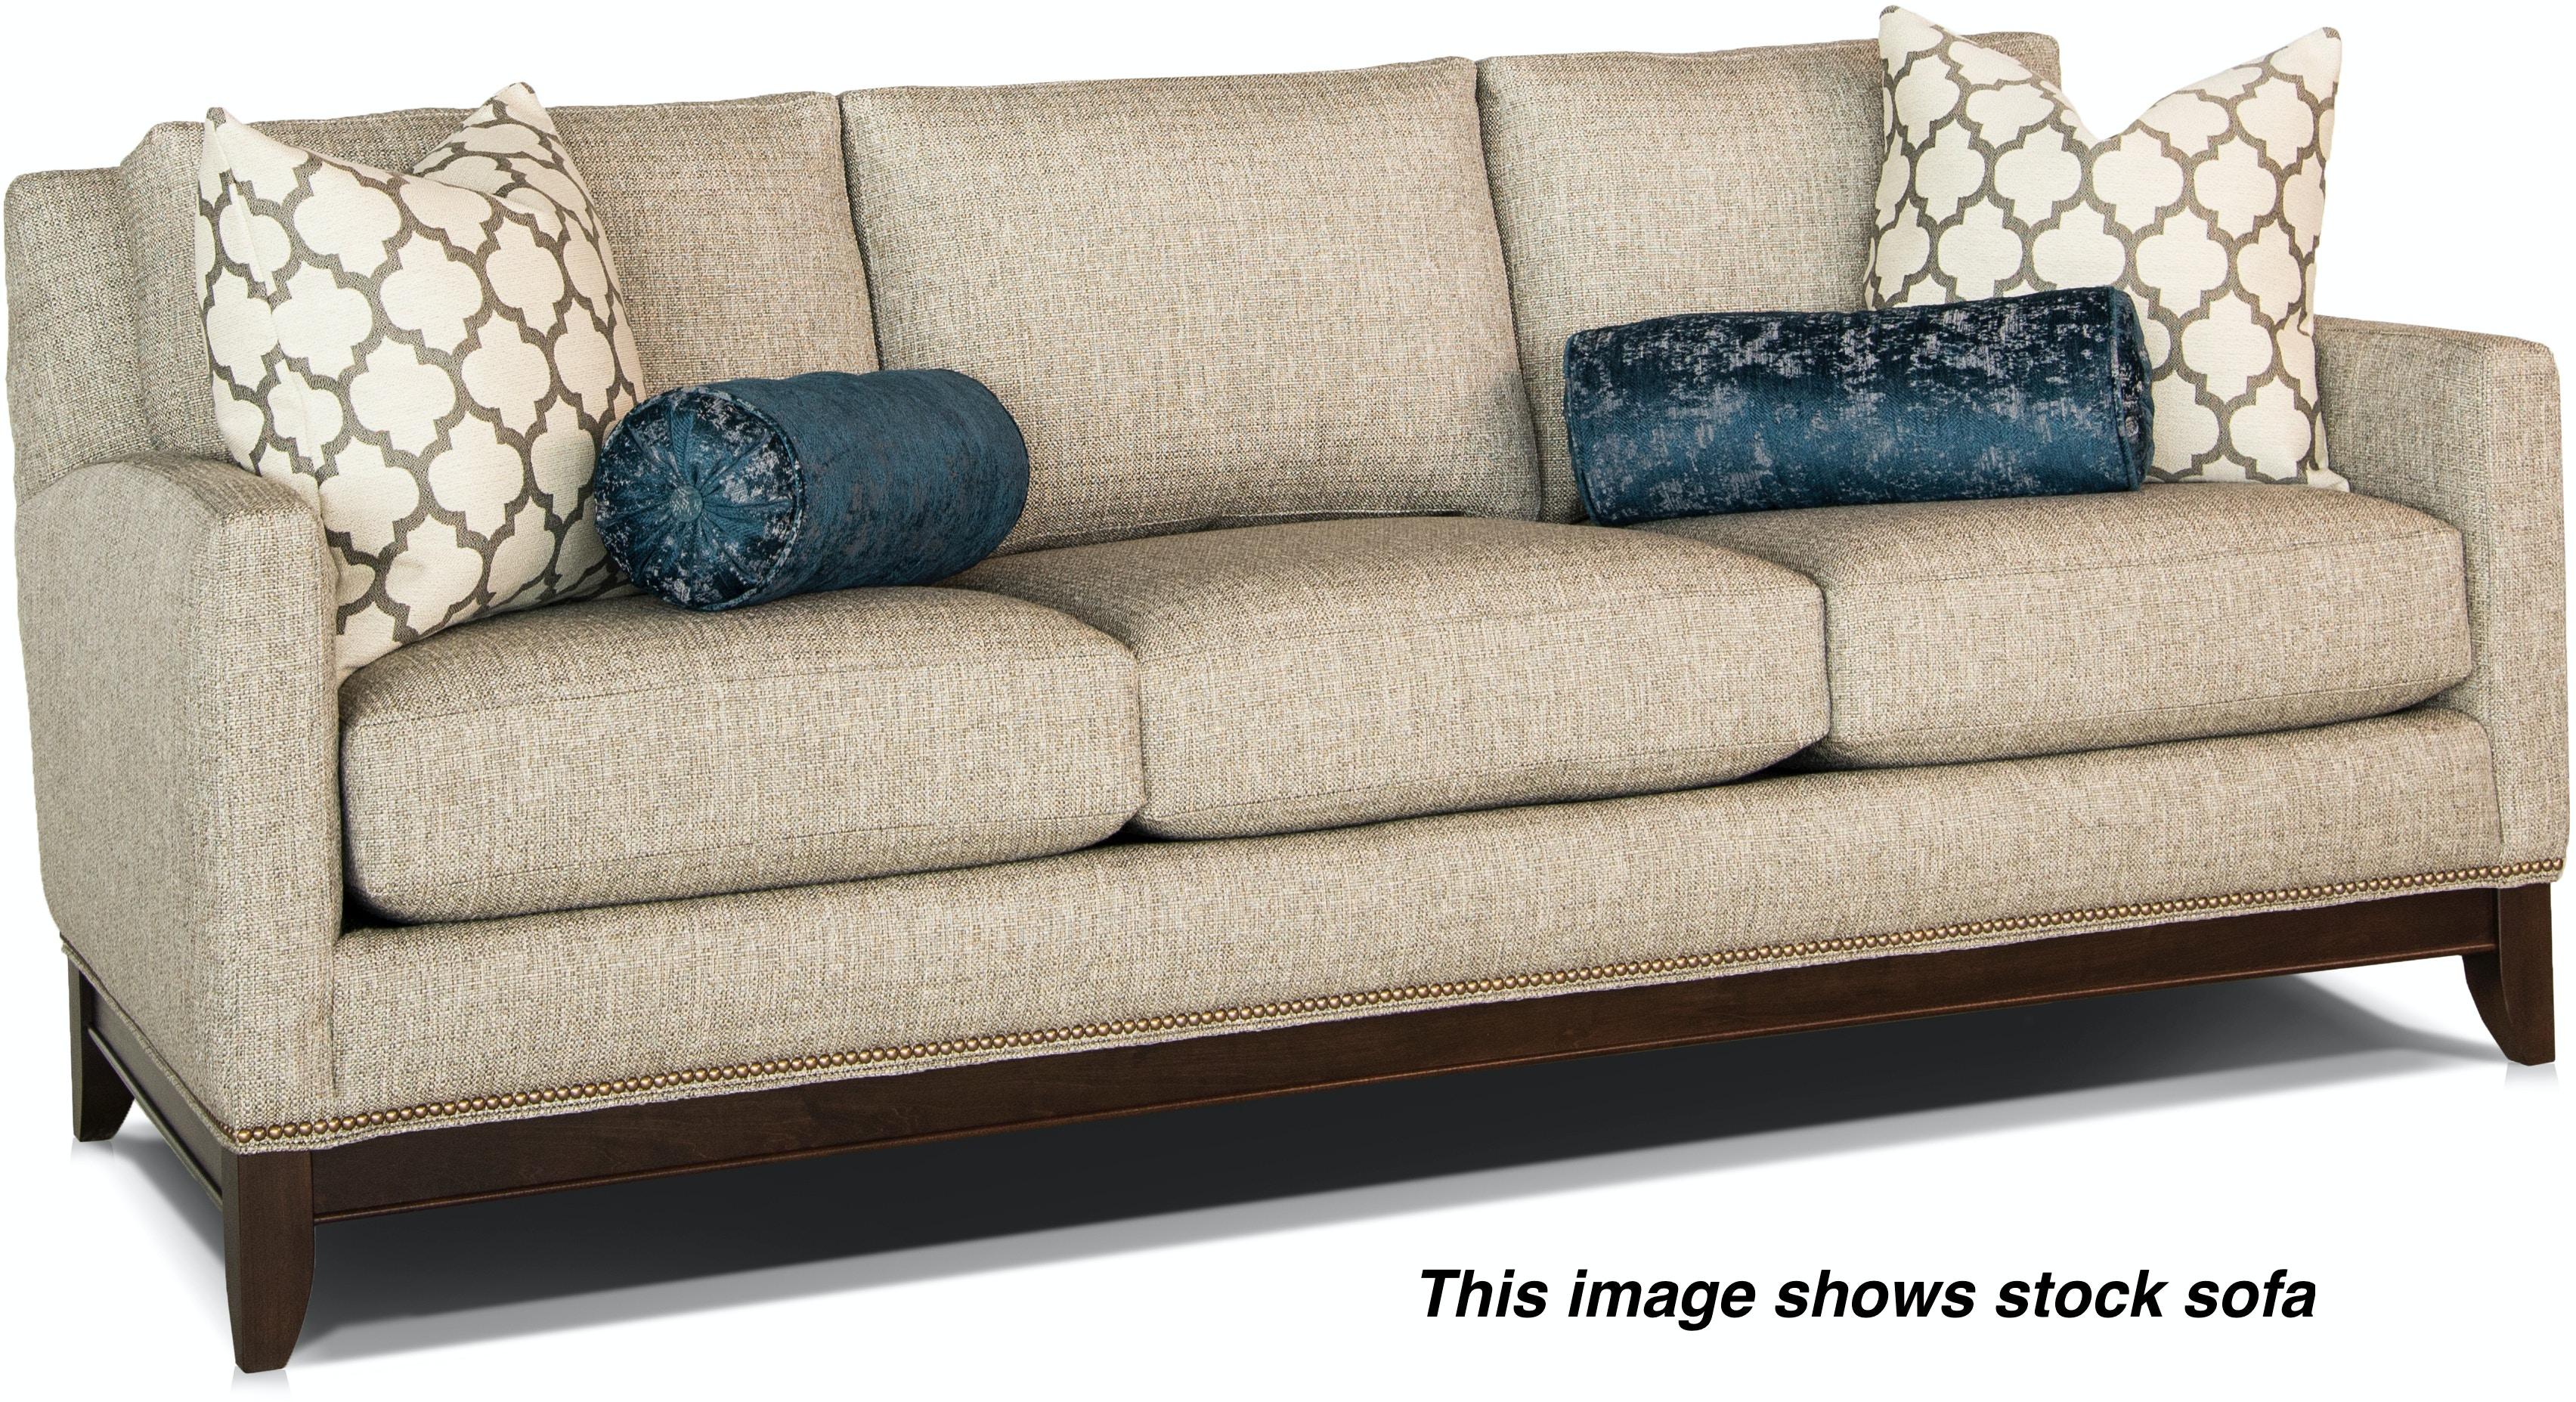 Smith Brothers Sofa 238 10